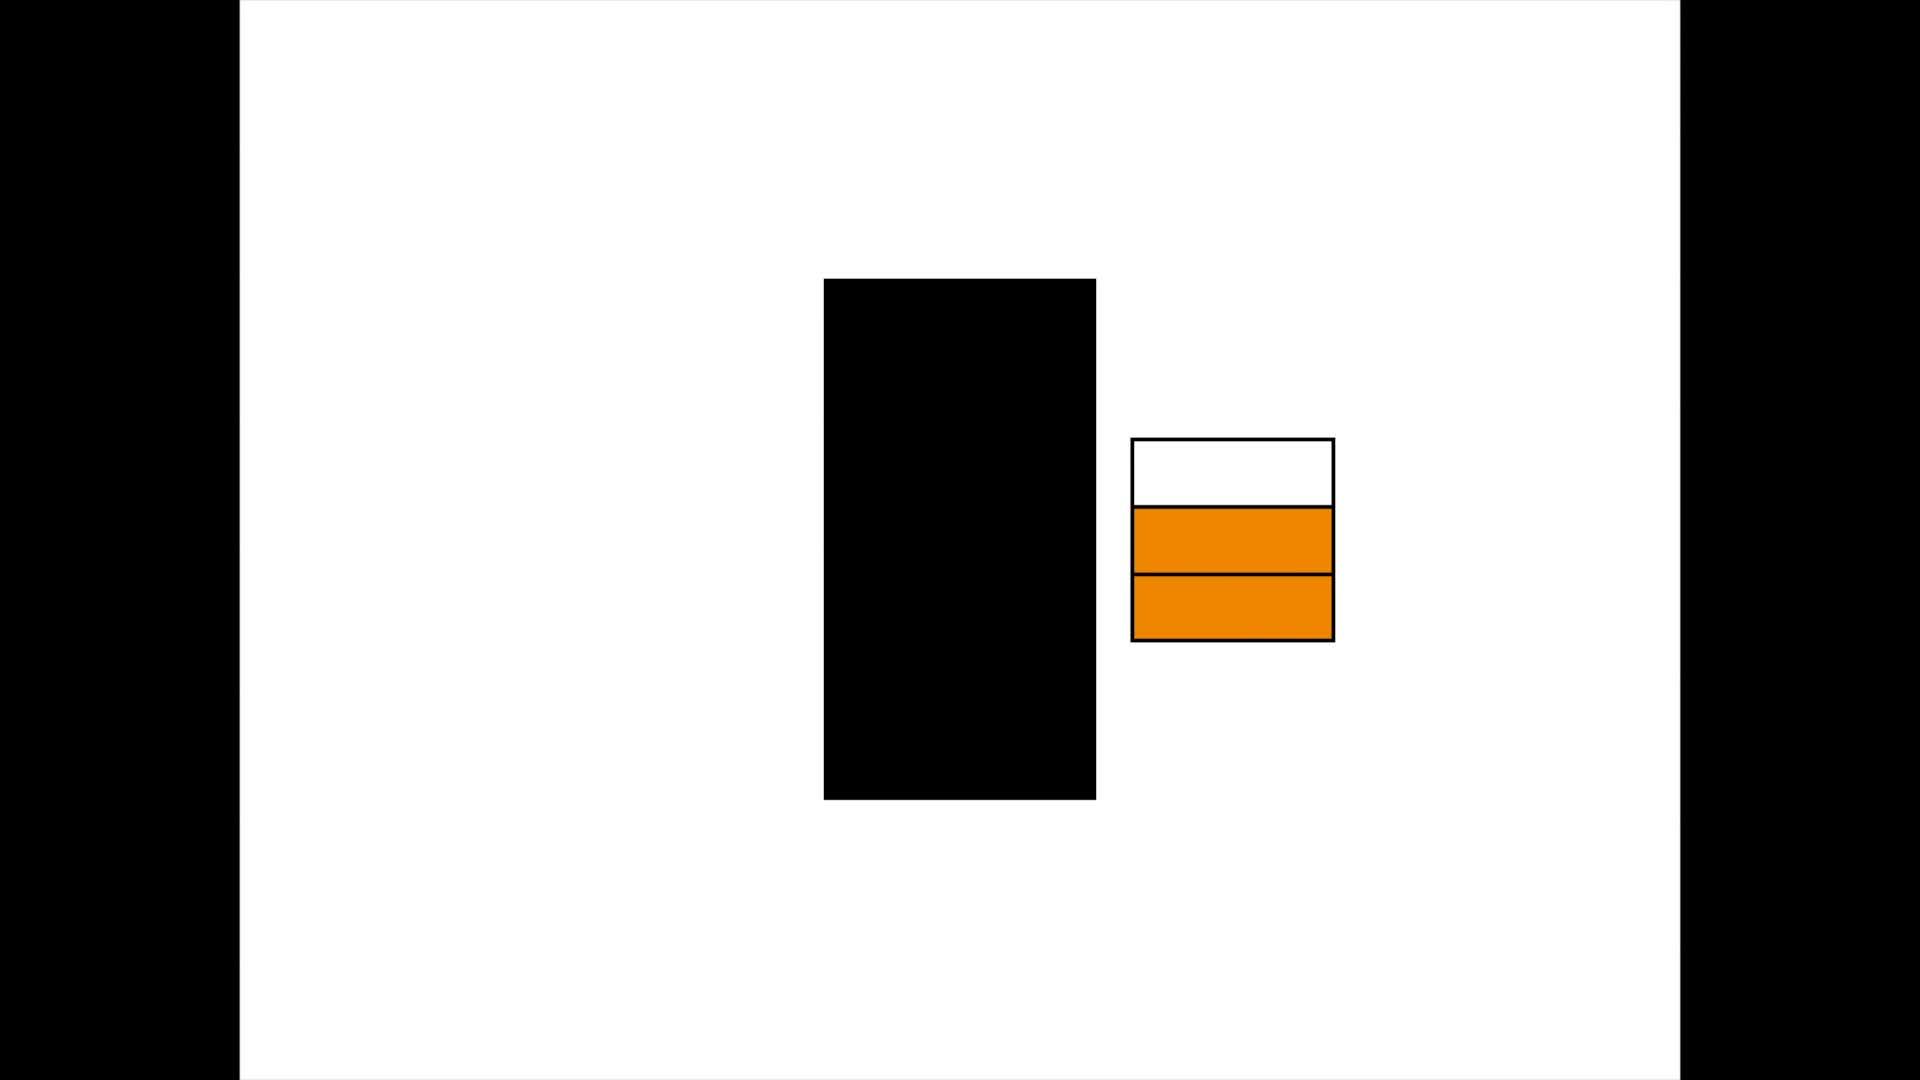 Black Box2 - Act 1